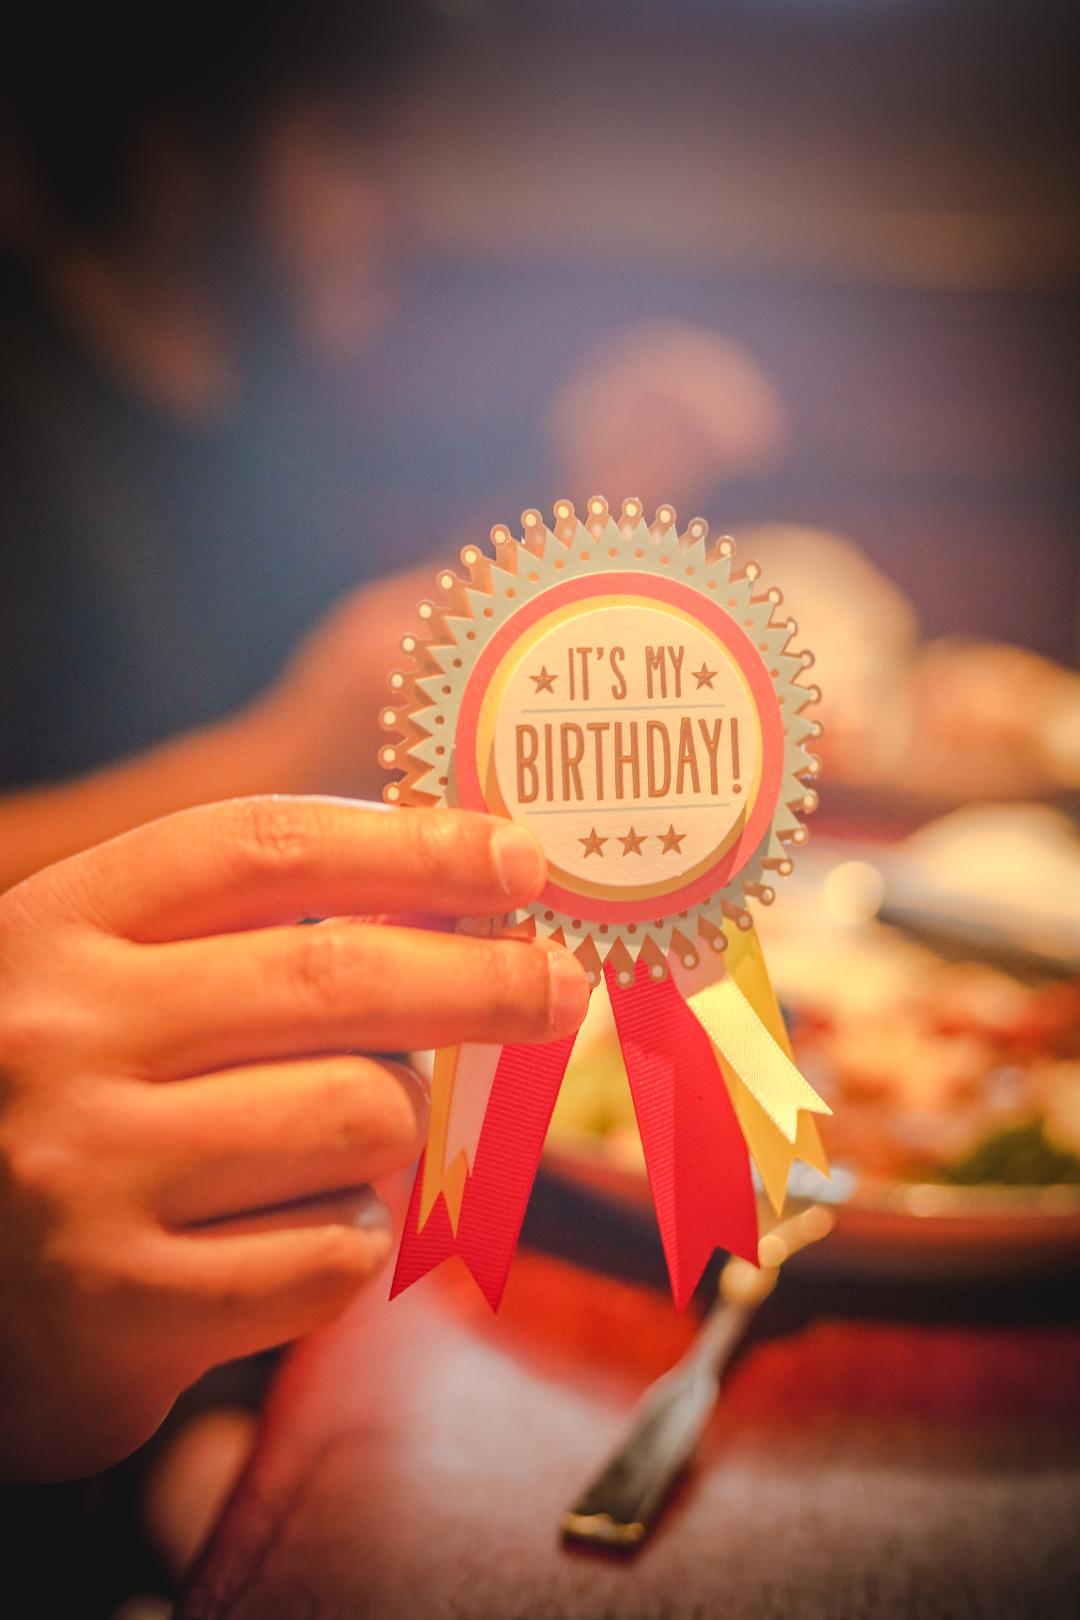 Best way to celebrate a birthday.